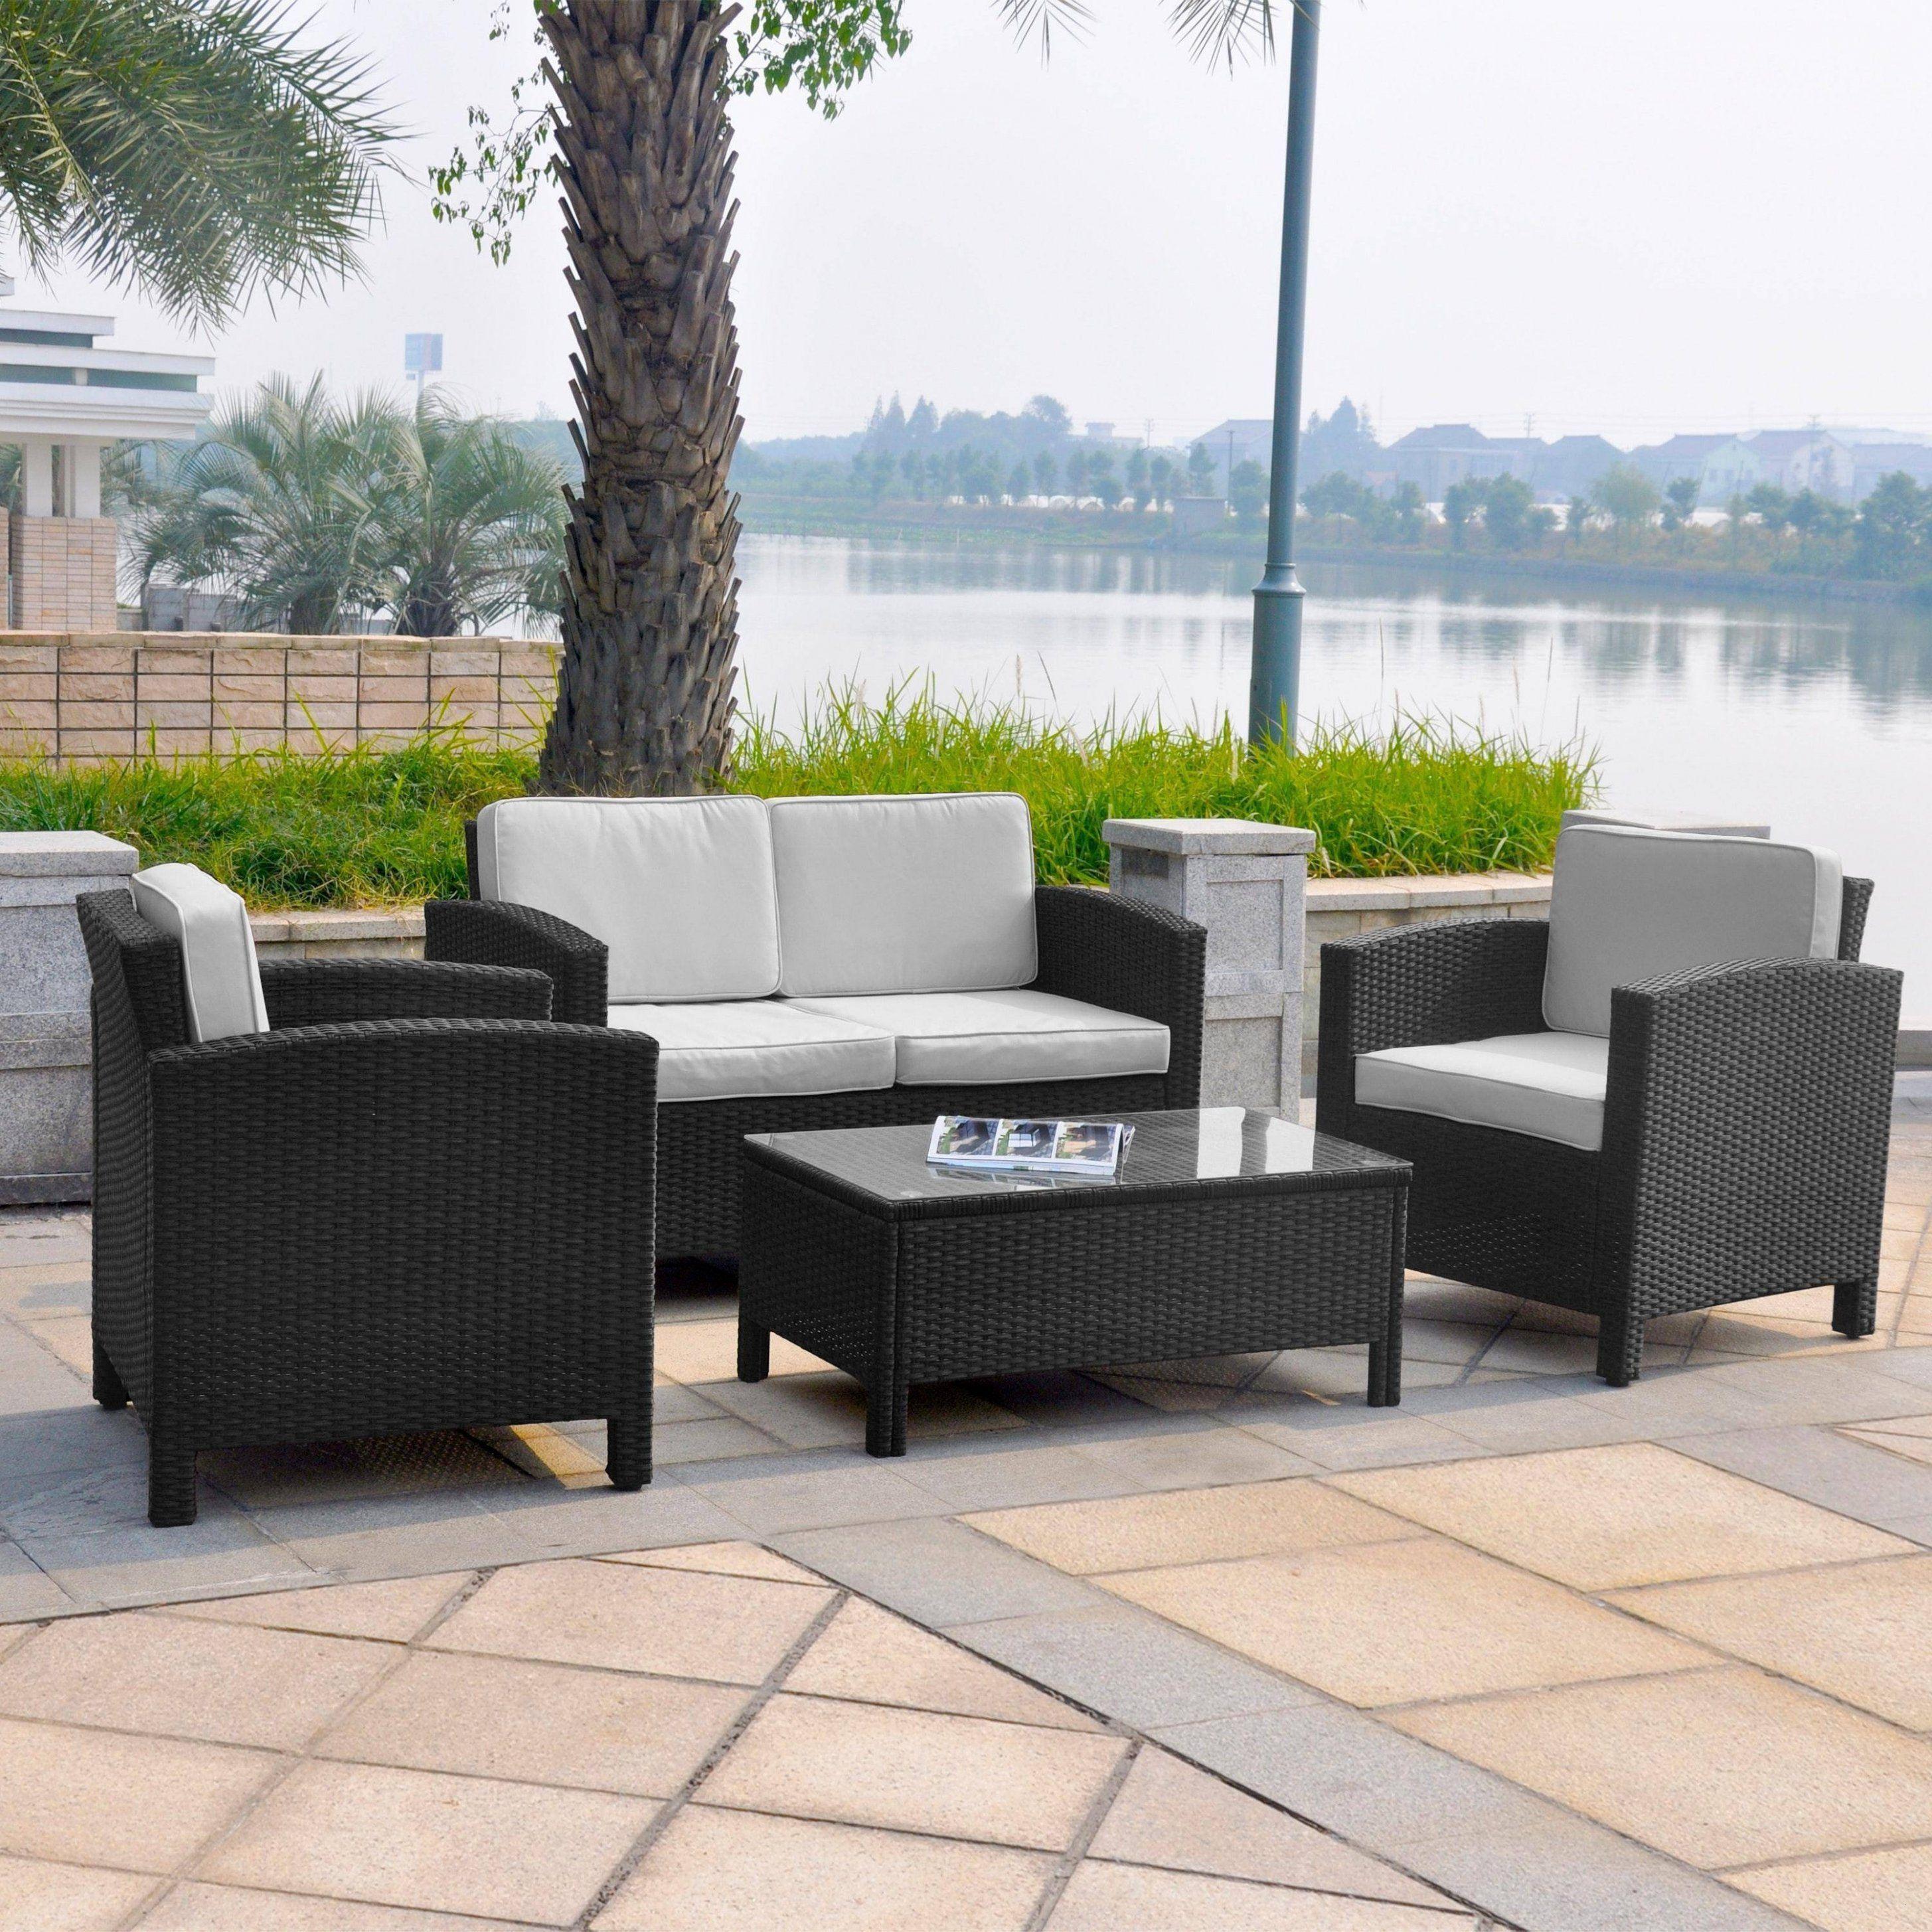 Best Of Bauholz Mobel Garten Furniture Sofa Set Rattan Garden Furniture Rattan Sofa